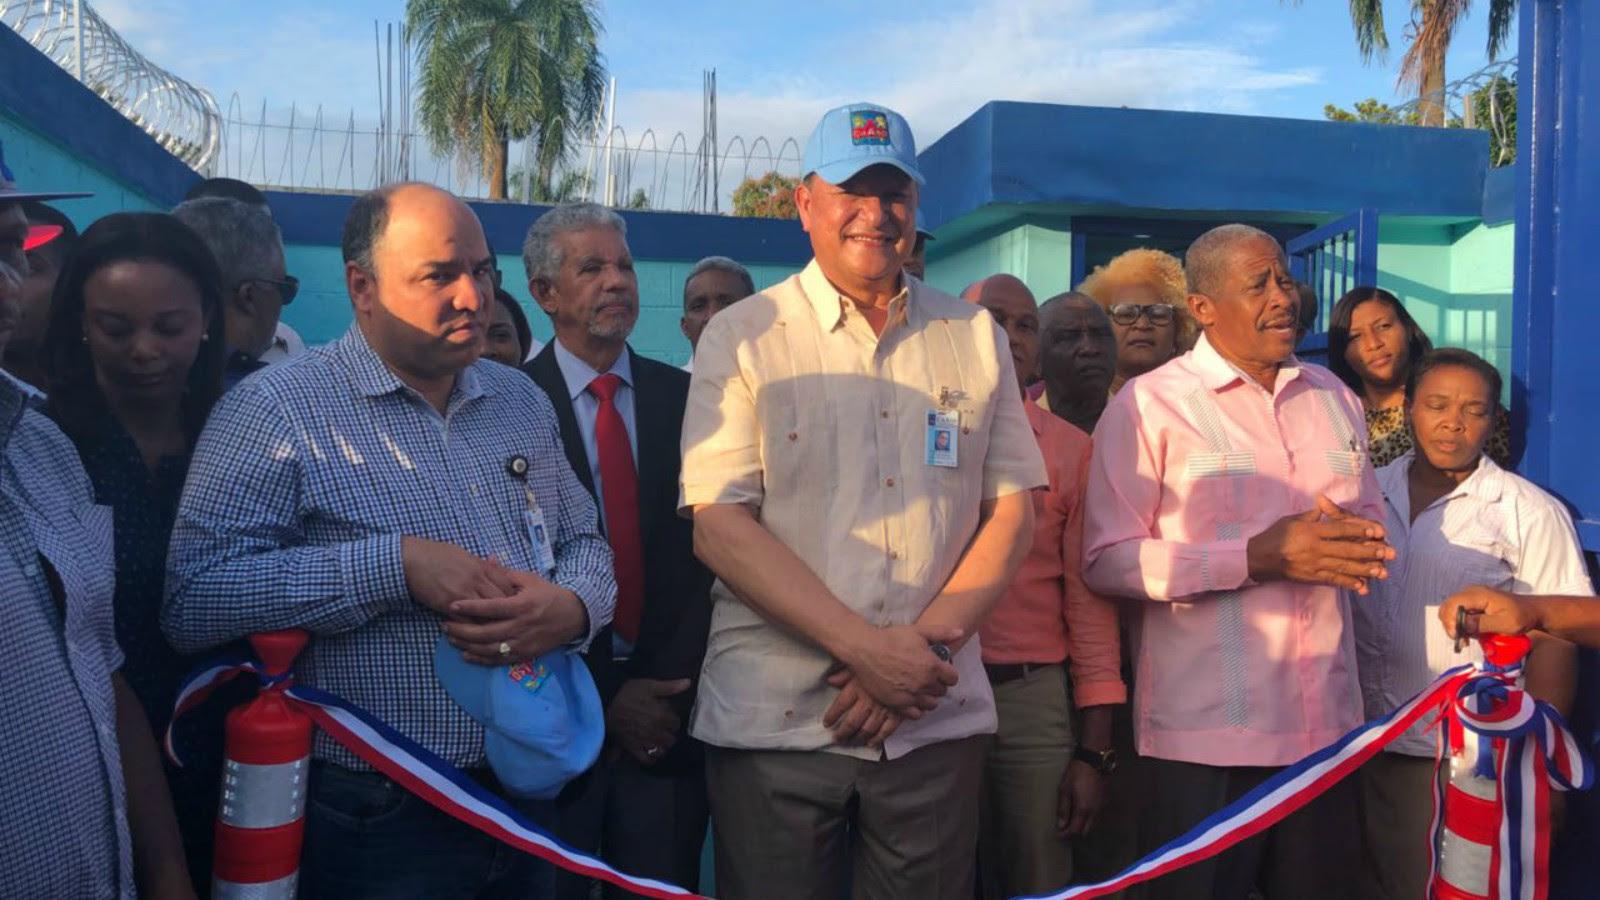 Gobierno entrega pozos para servir agua potable en varios sectores de Pedro Brand